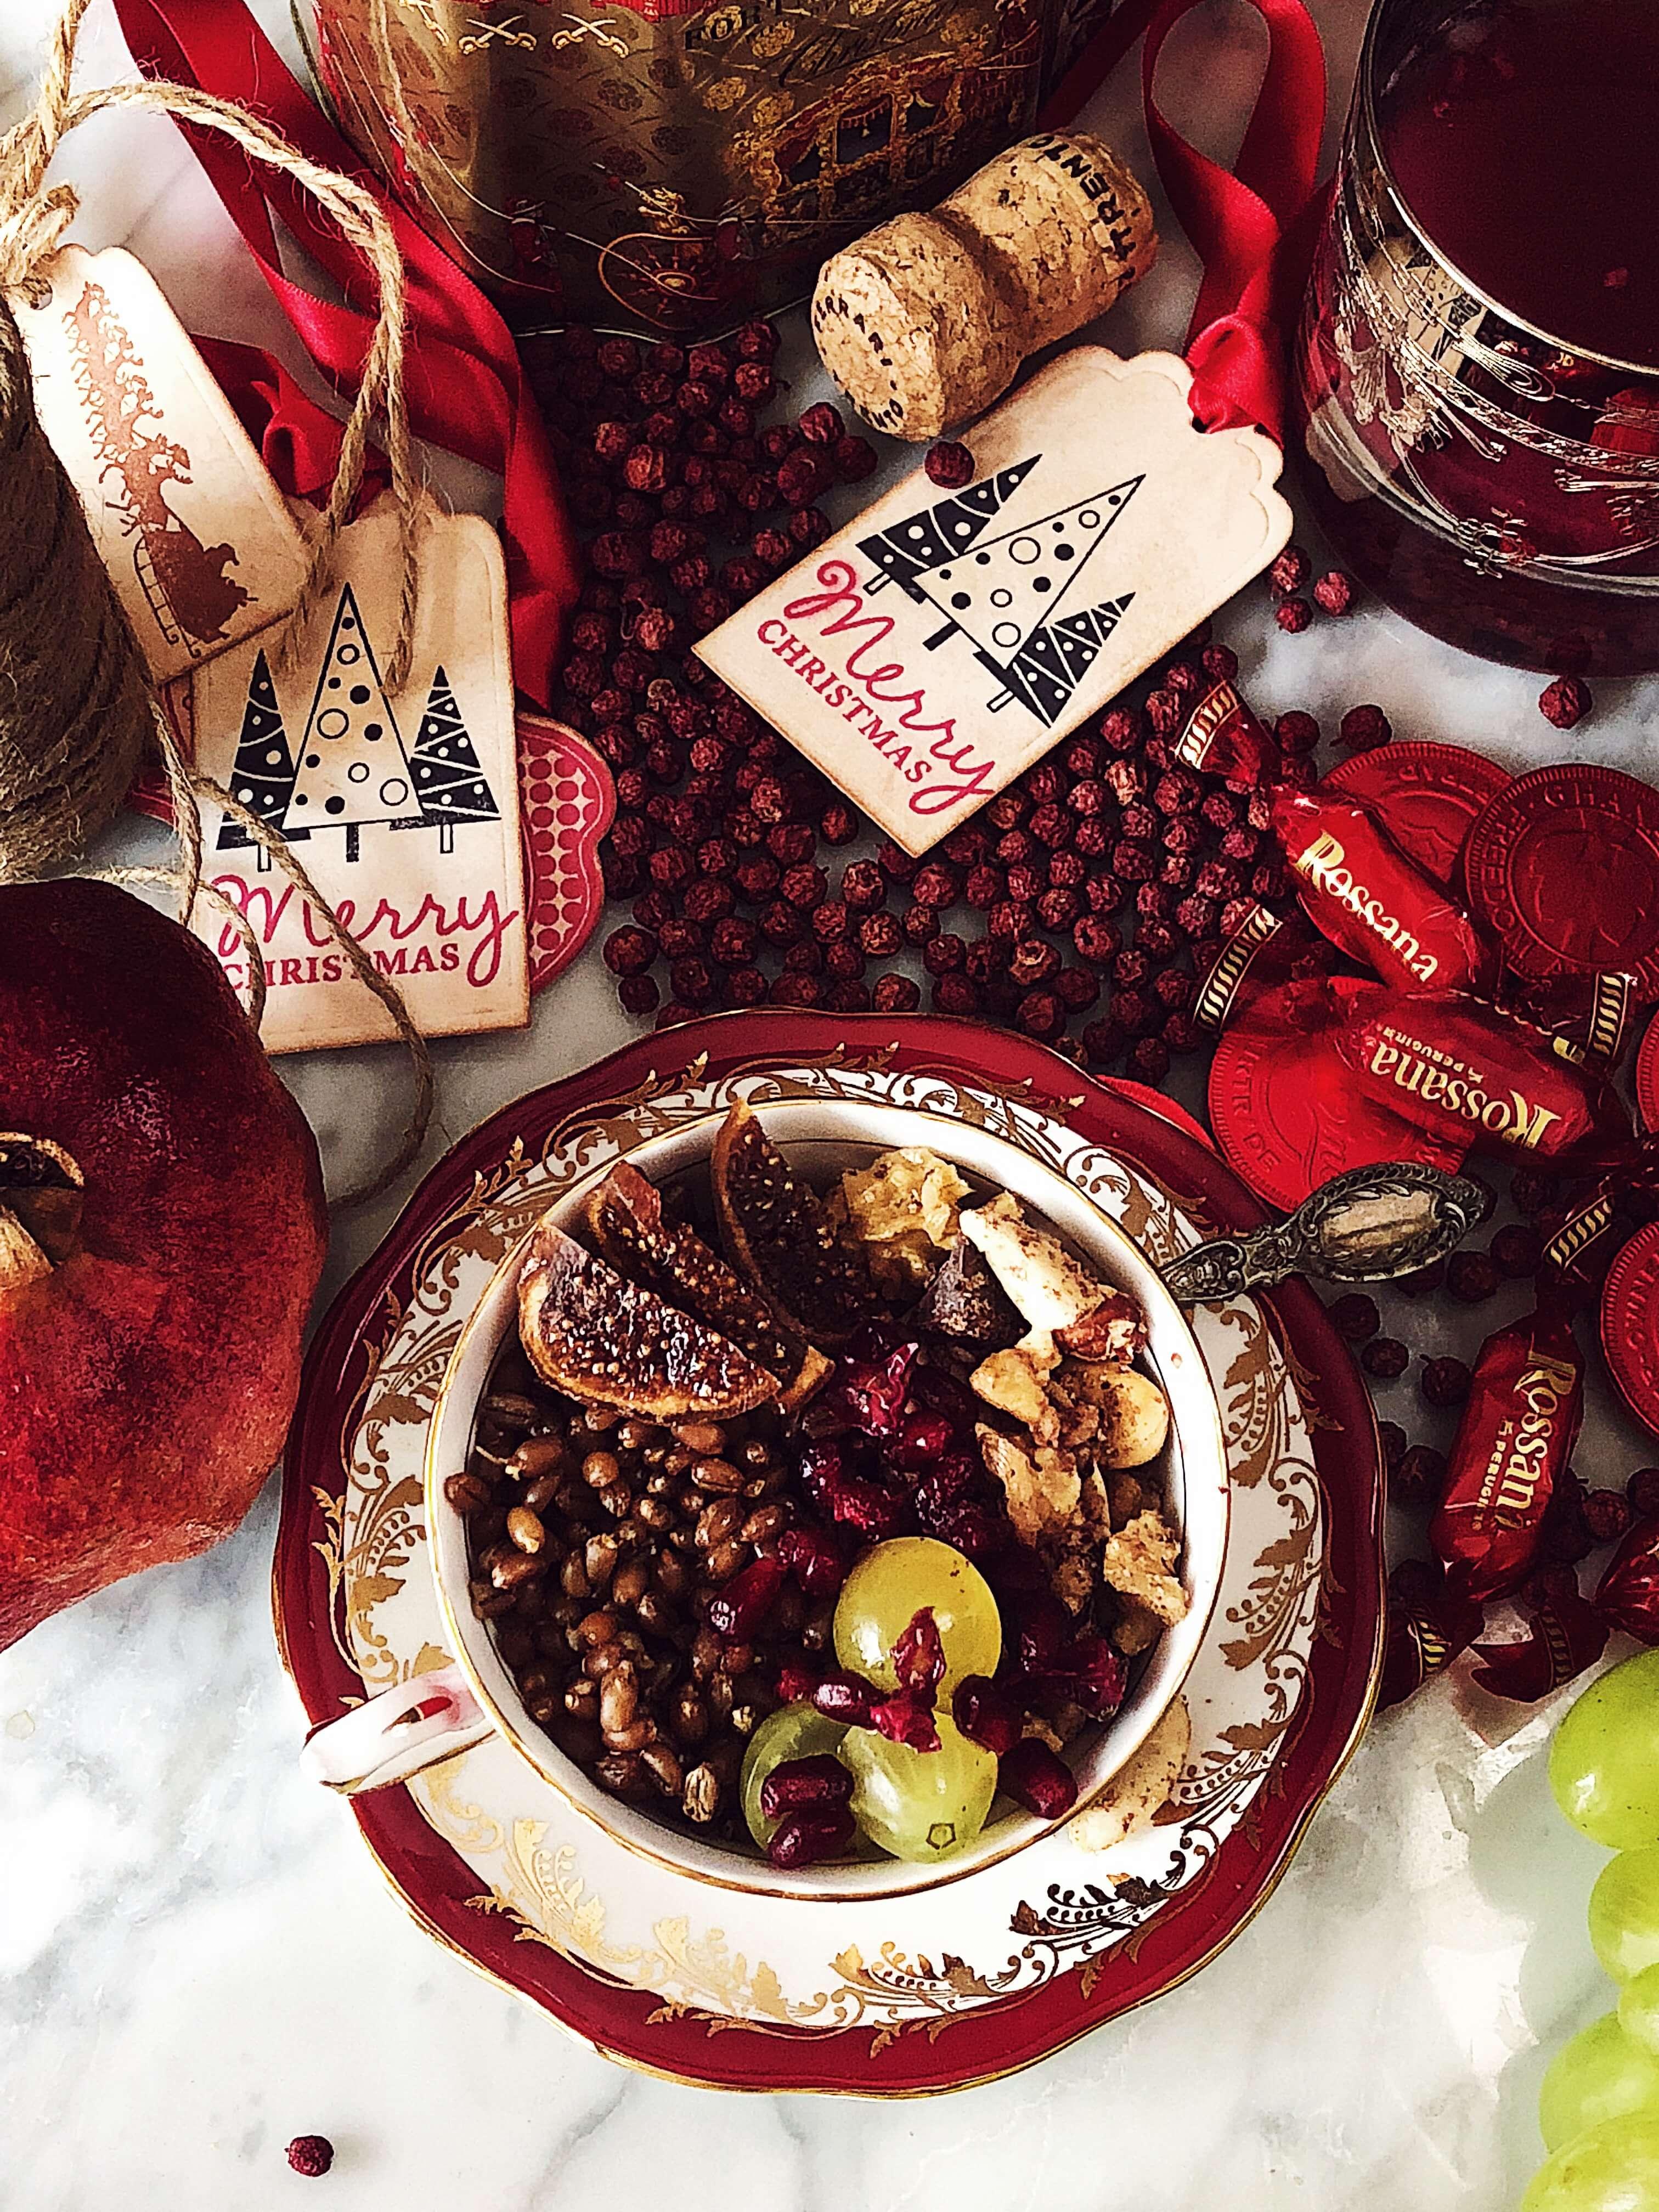 Italian cuisine magazine: traditional Italian recipes #thegourmetmag #christmas #christmasideas